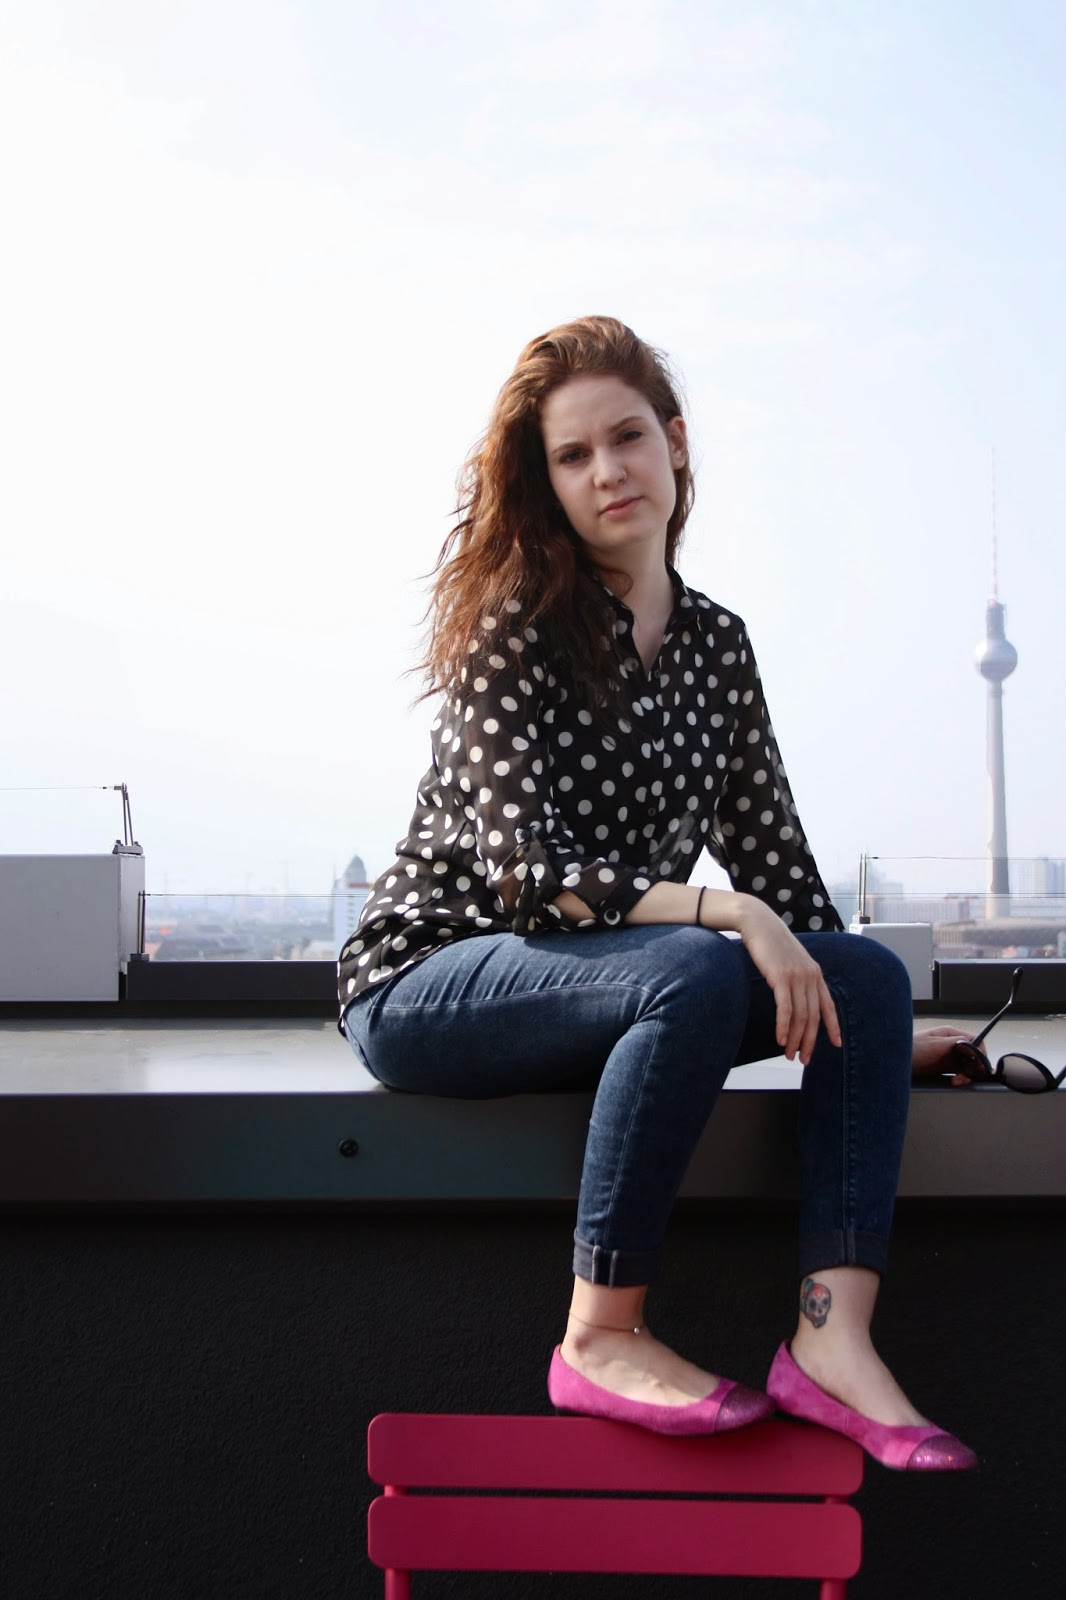 OOTD Clarks Ballerinas Flussperle Blog primark Urban Outfitters Berlin fernsehturm